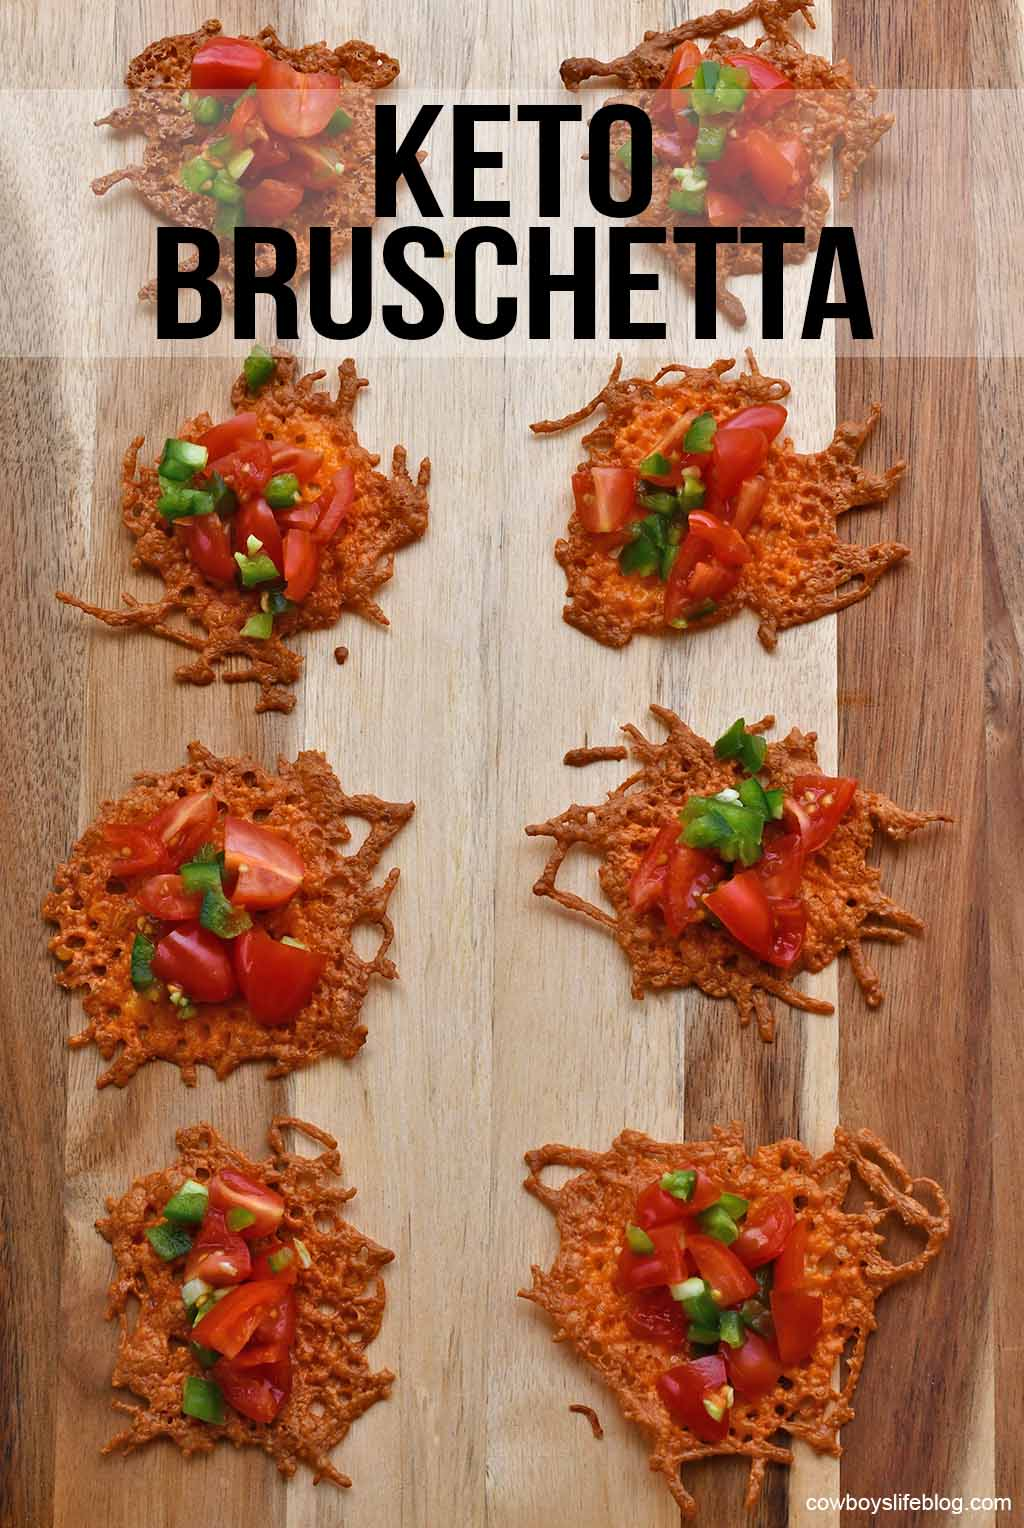 Keto Bruschetta